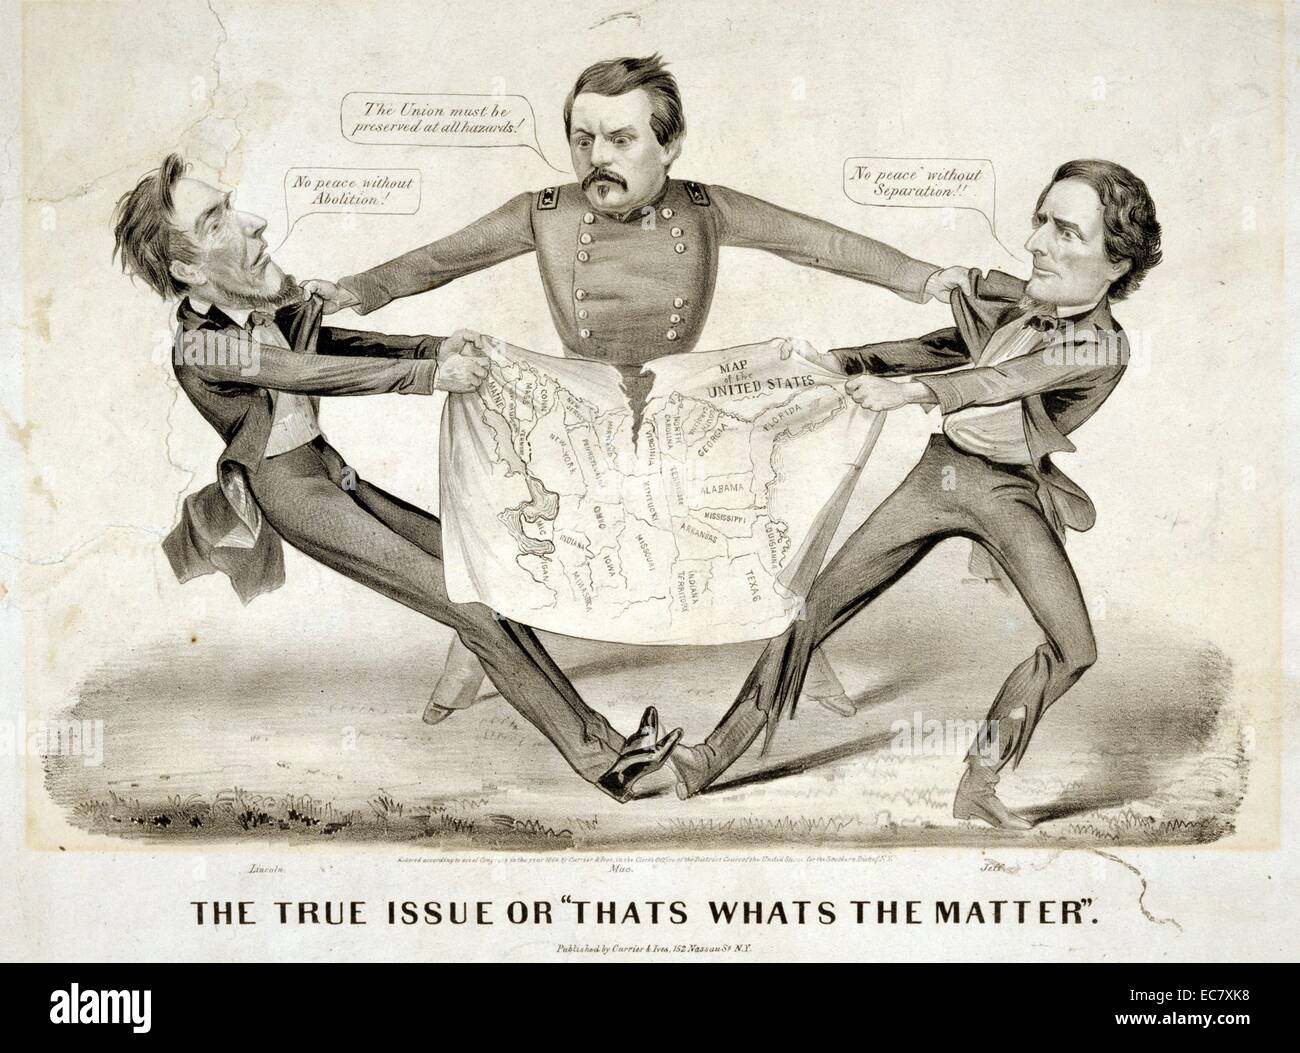 Pro-Democrat cartoon from 1860s - Stock Image